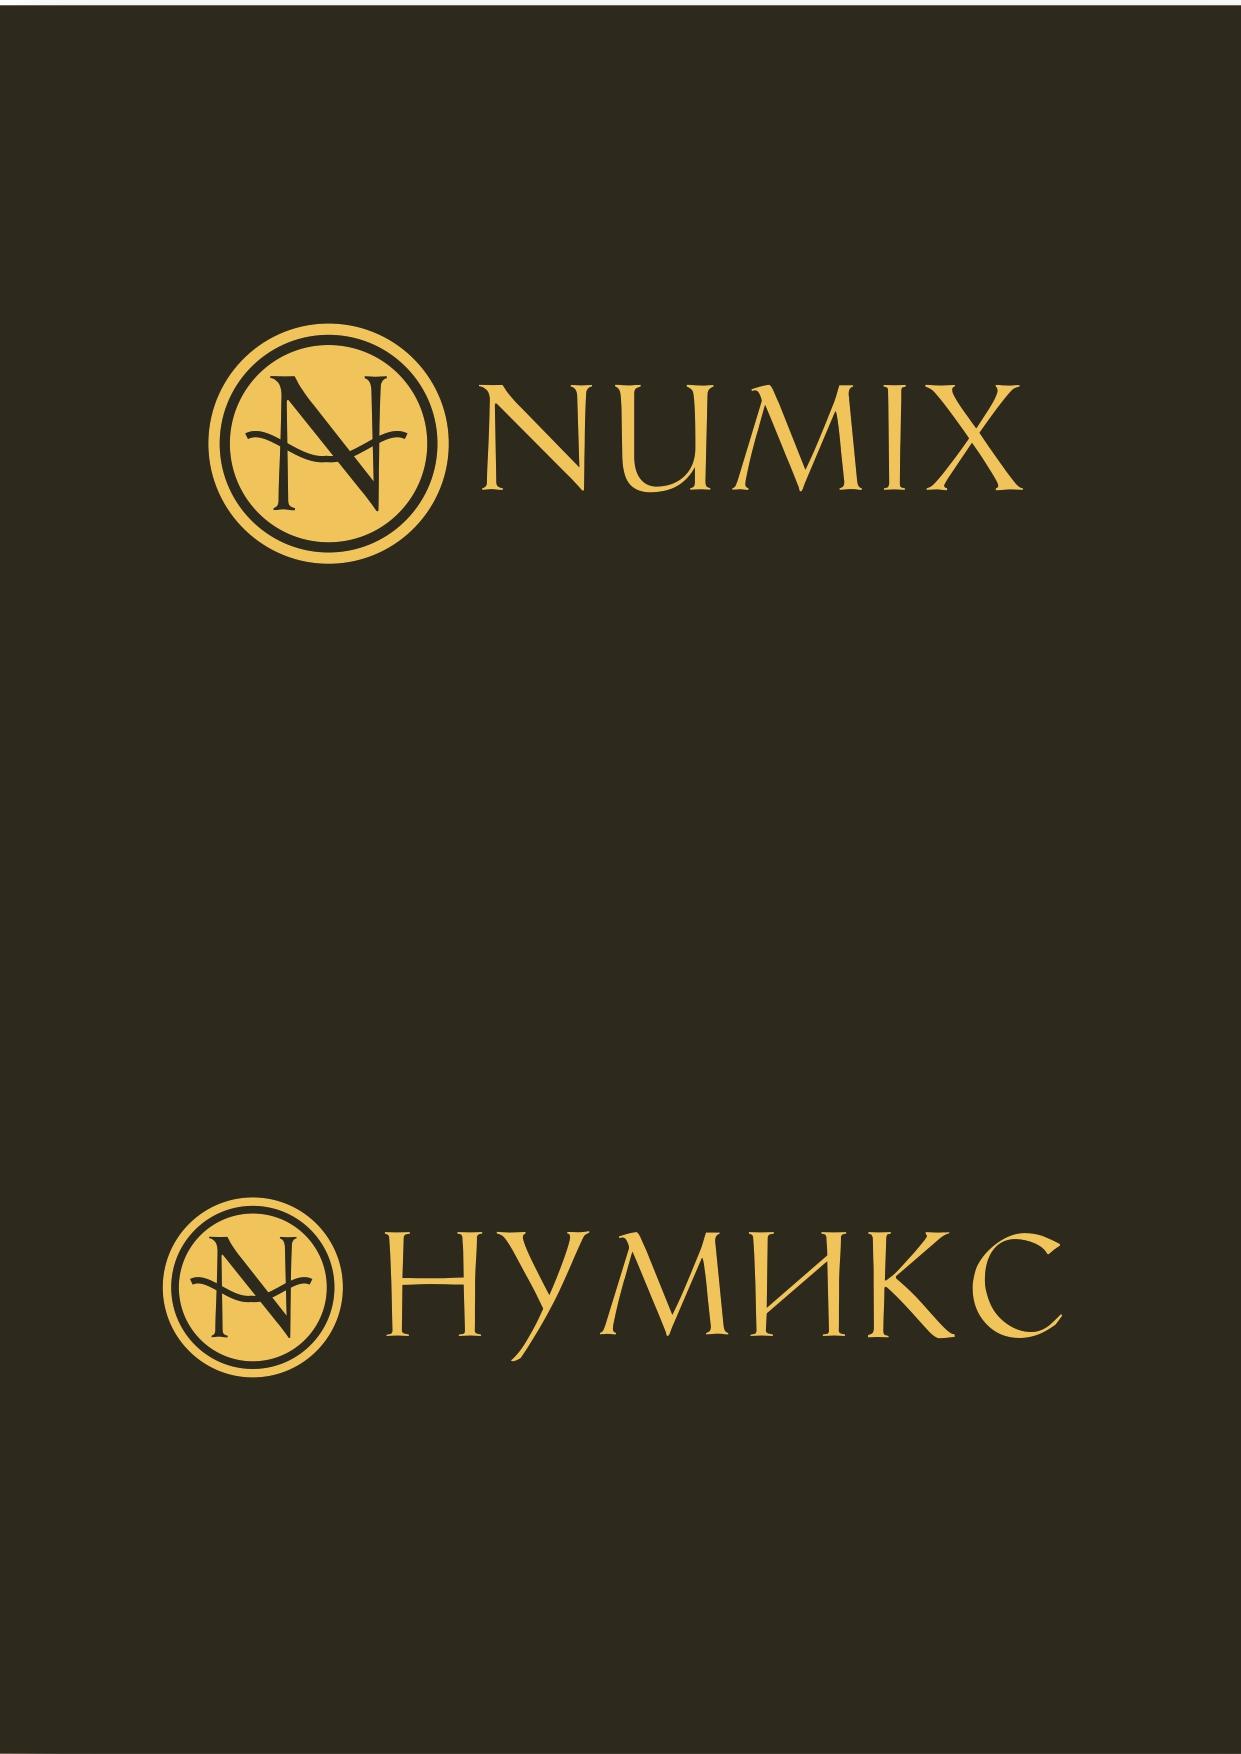 Логотип для интернет-магазина фото f_0295ec7d68c1cc68.jpg